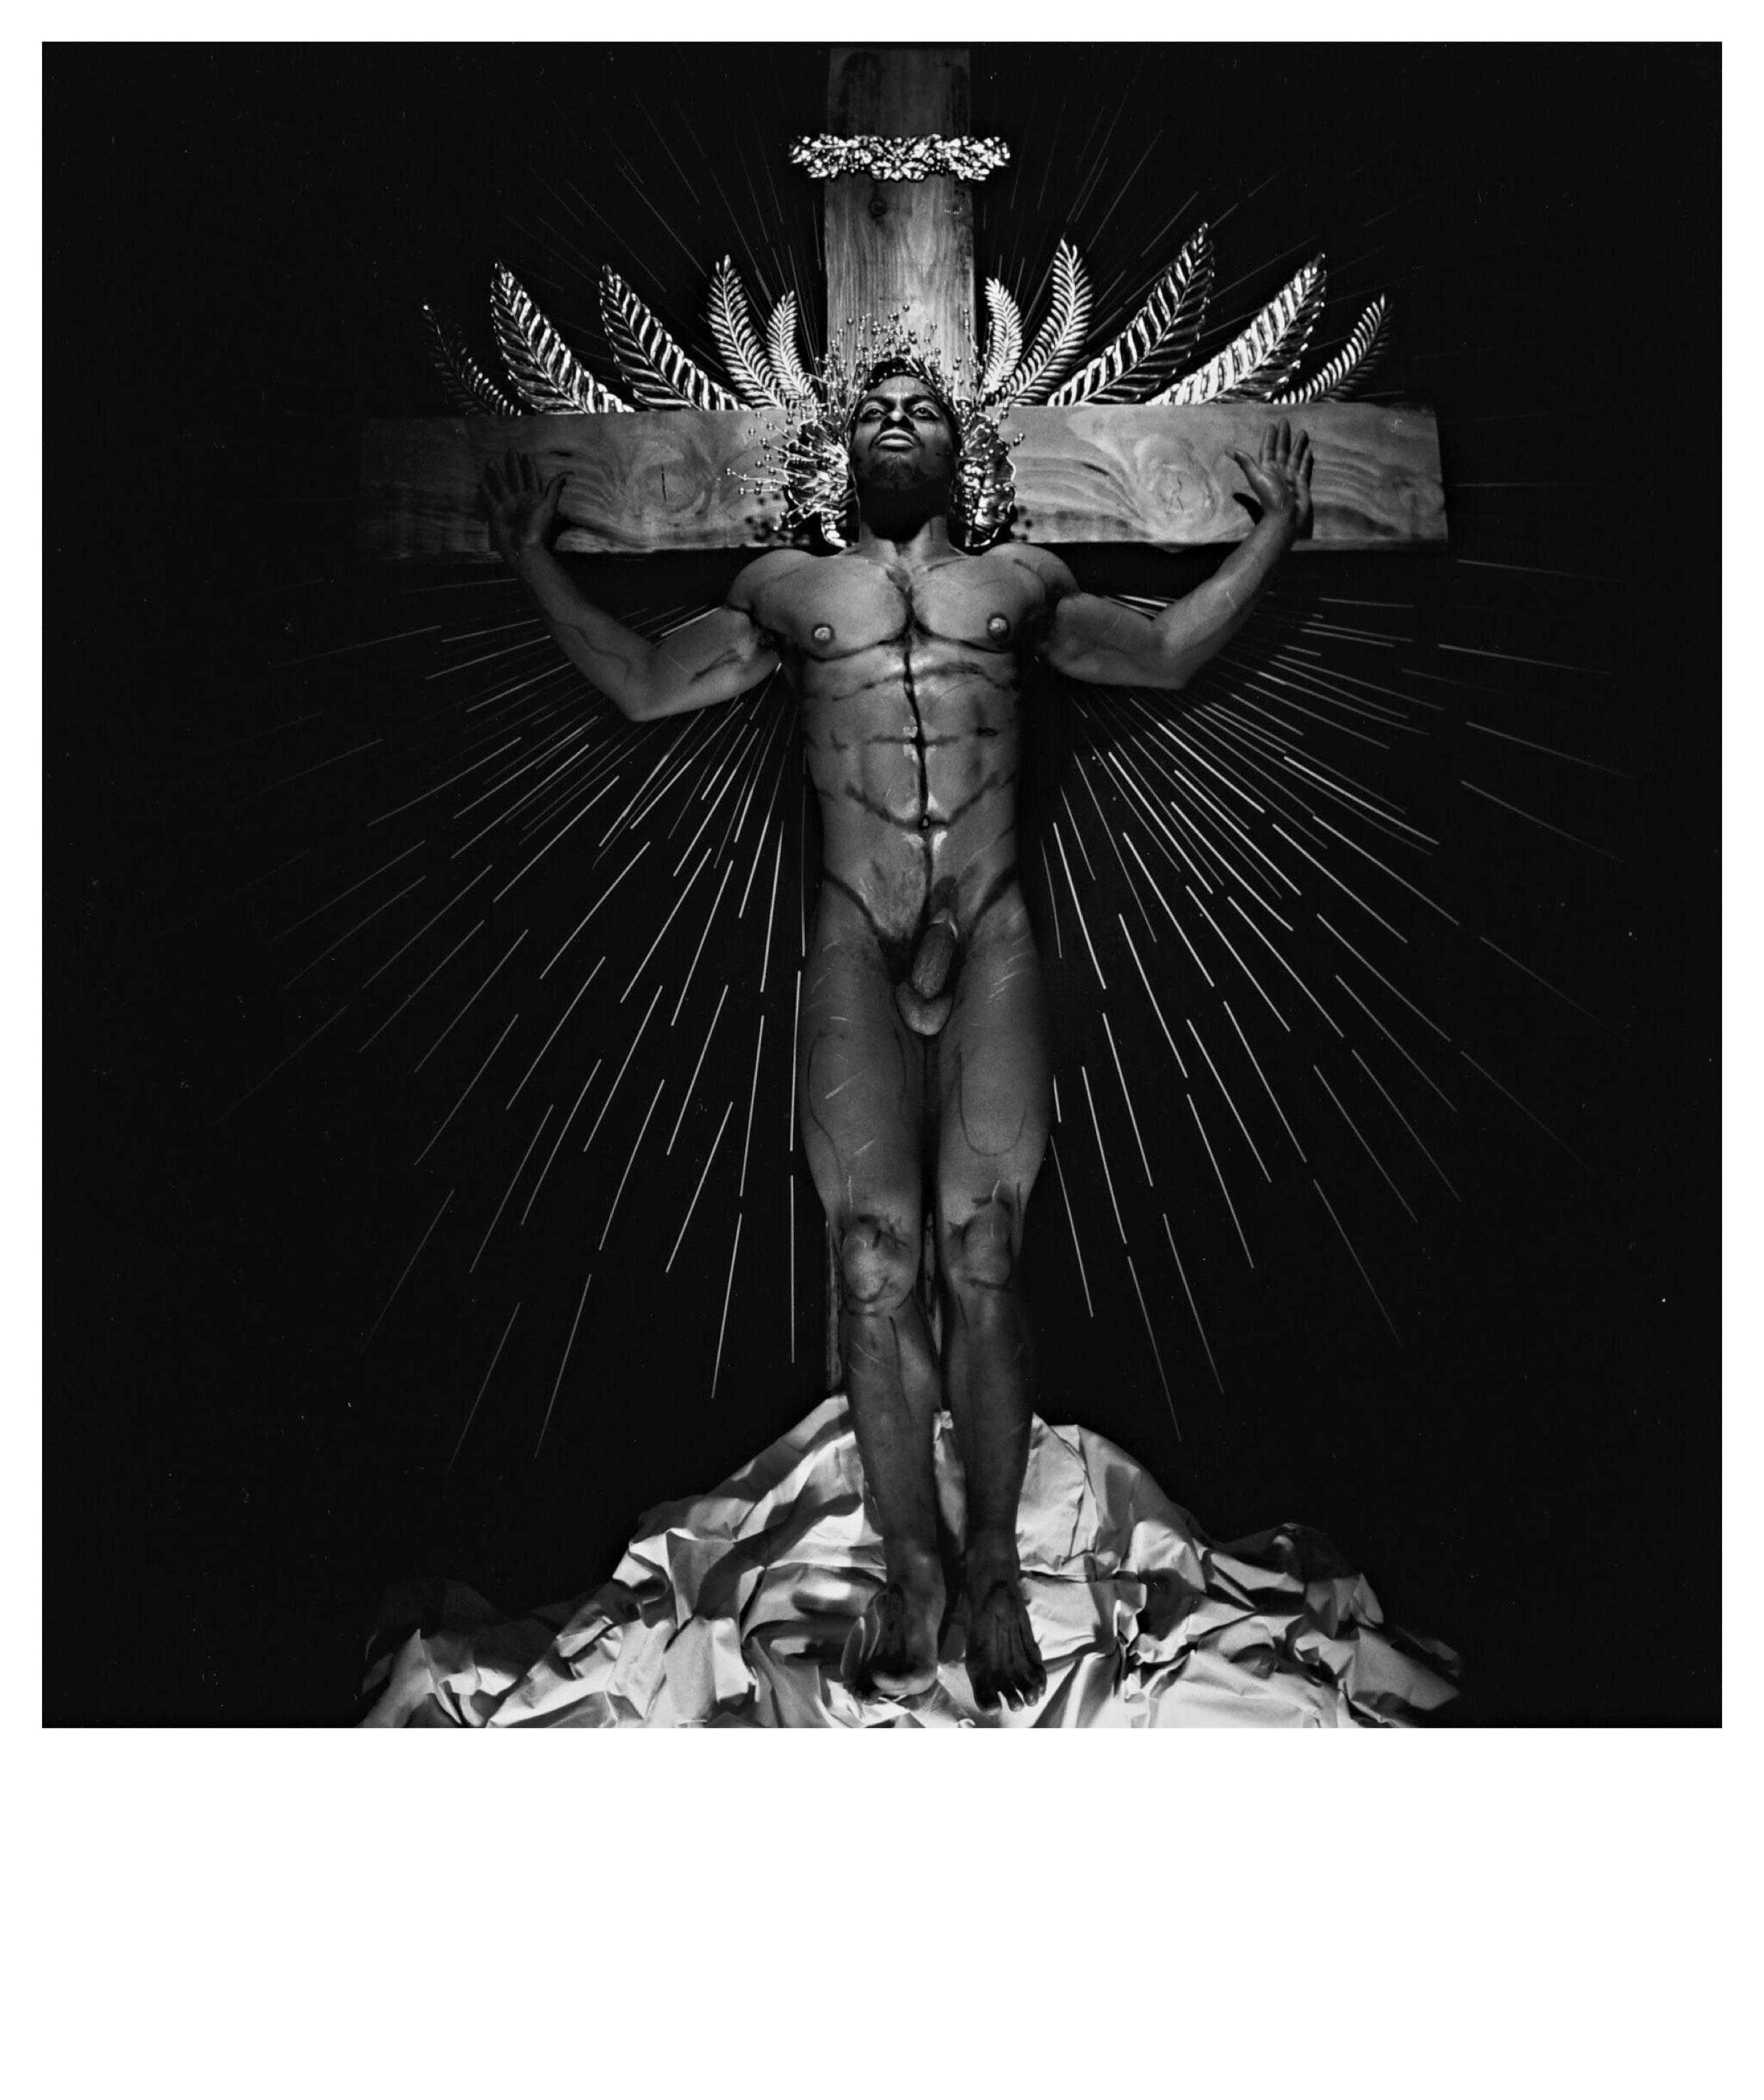 Steven Arnold - Black Jesus. 1985. Gelatina de plata vintage. 20' x 16' : 50,8 x 40,64 cm